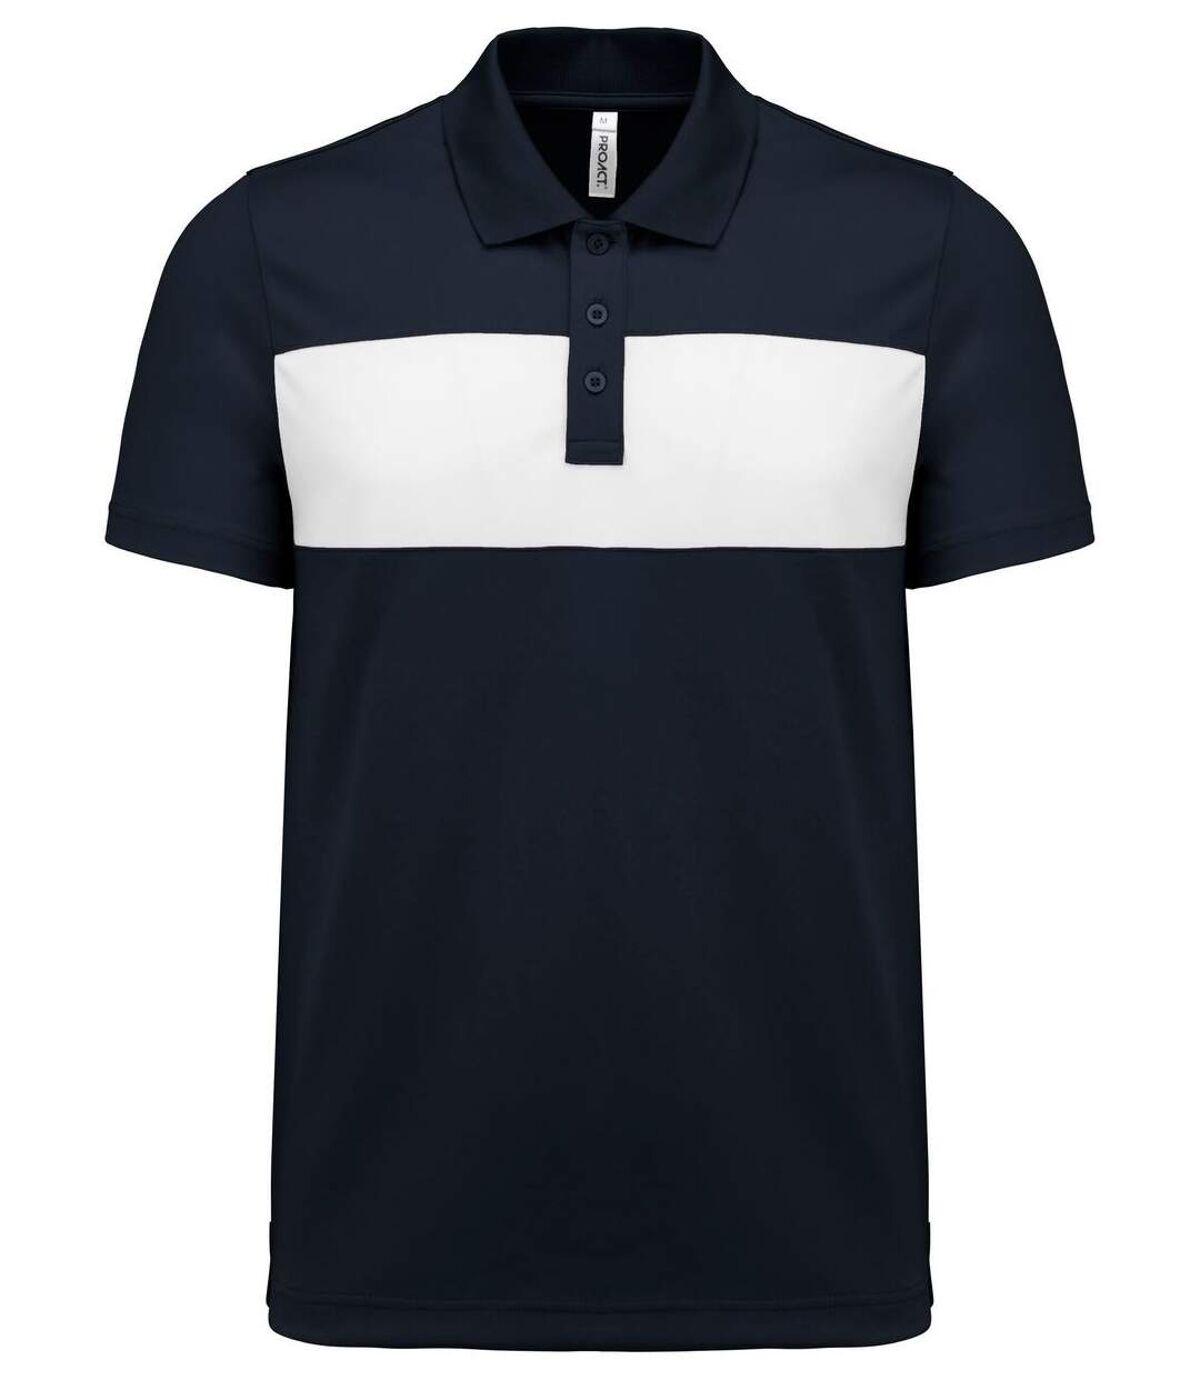 Polo sport - PA493 - bleu marine - manches courtes